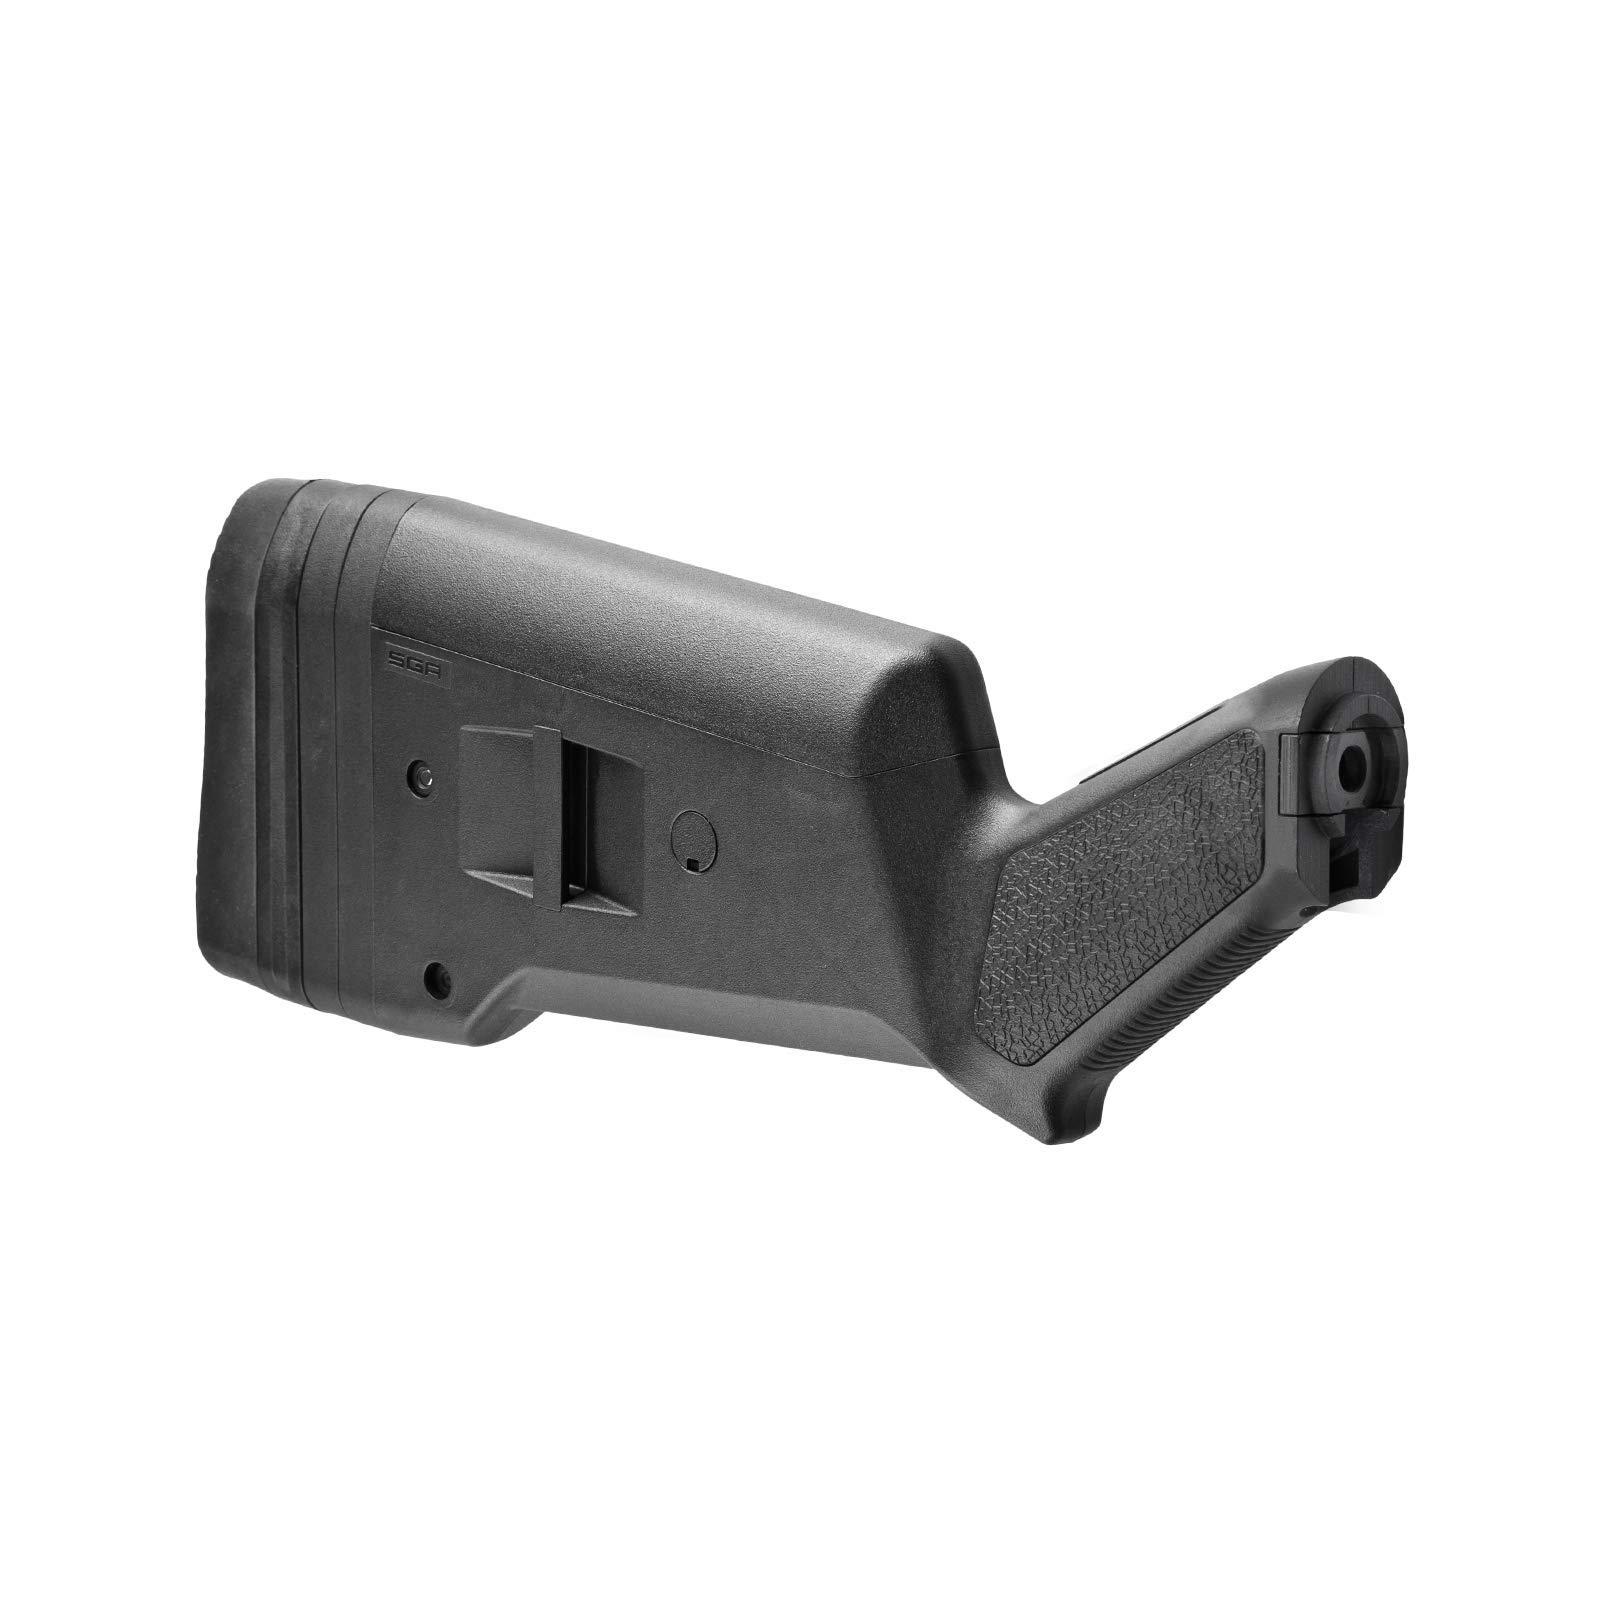 Magpul SGA Ambidextrous Butt Stock Mossberg 500/590/590A1 Shotgun, Black by Magpul